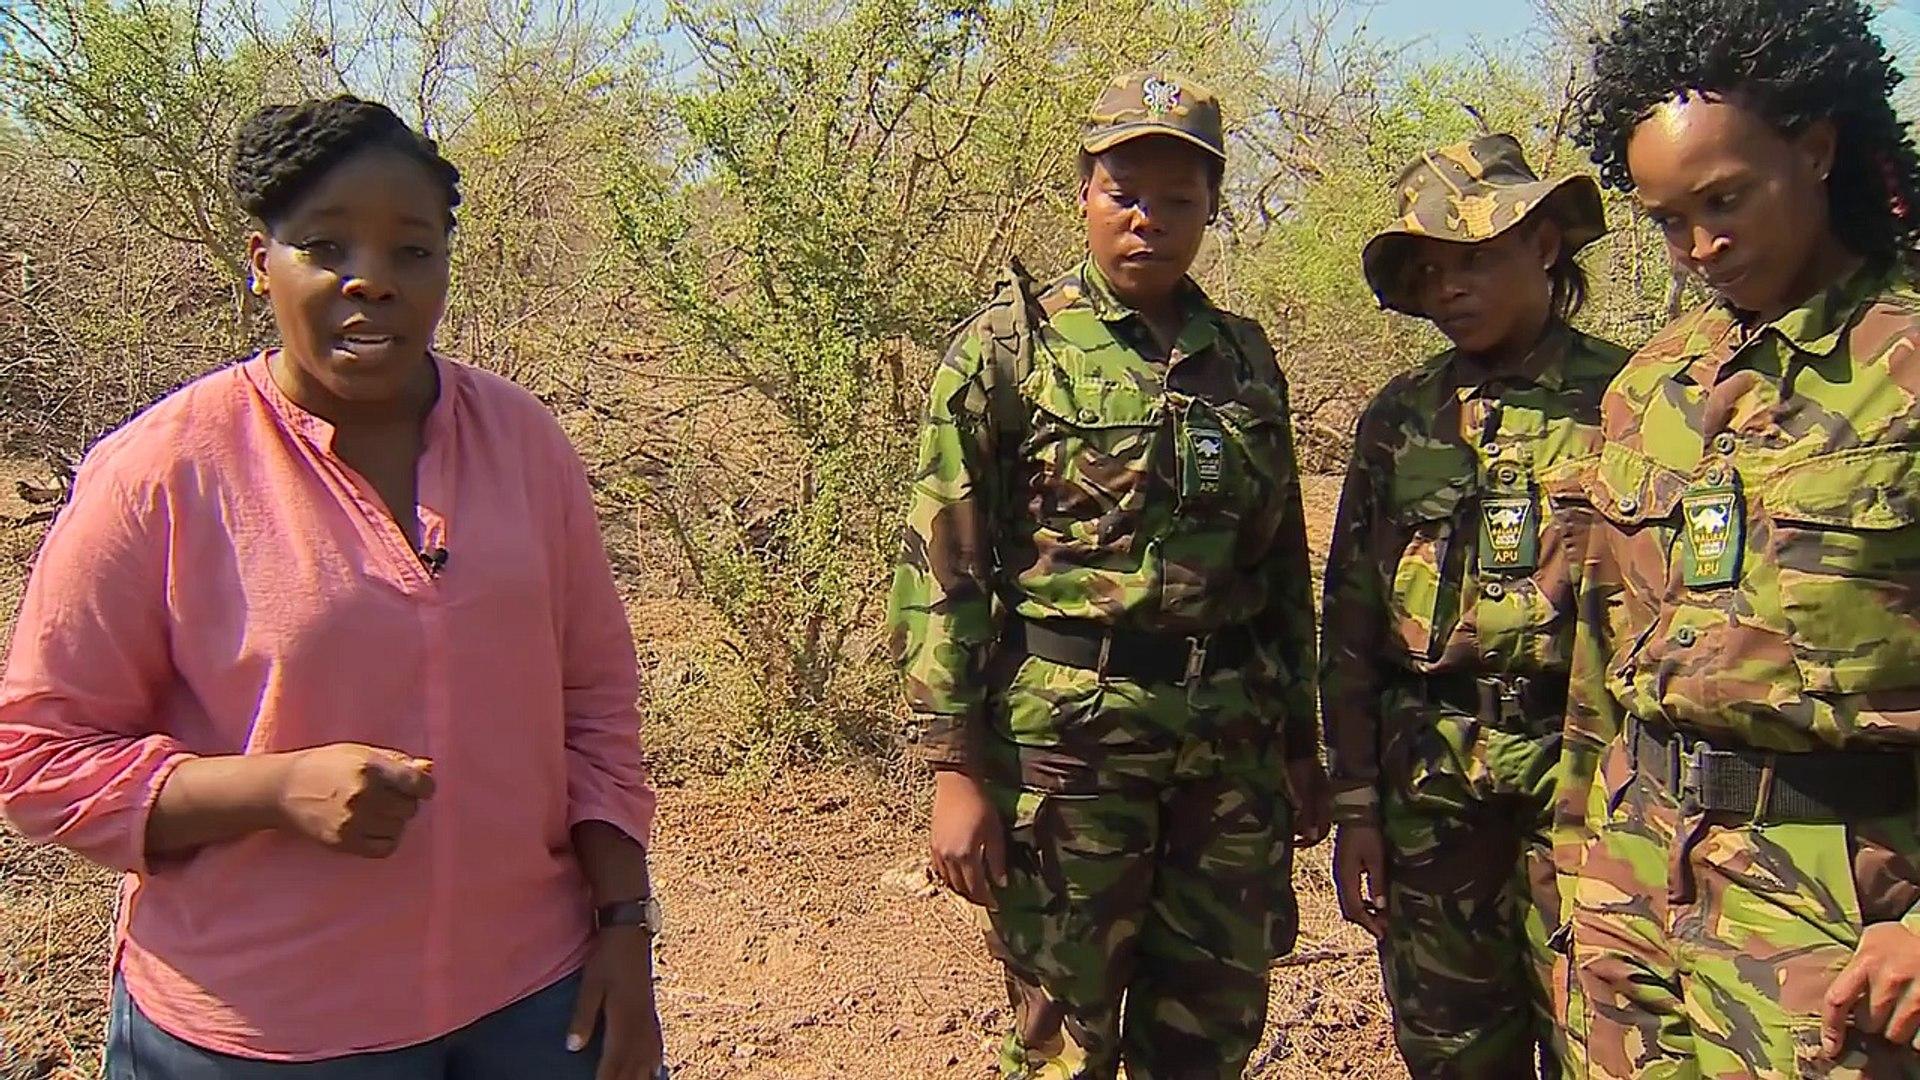 Extinction warning for Africas rhinos - BBC News